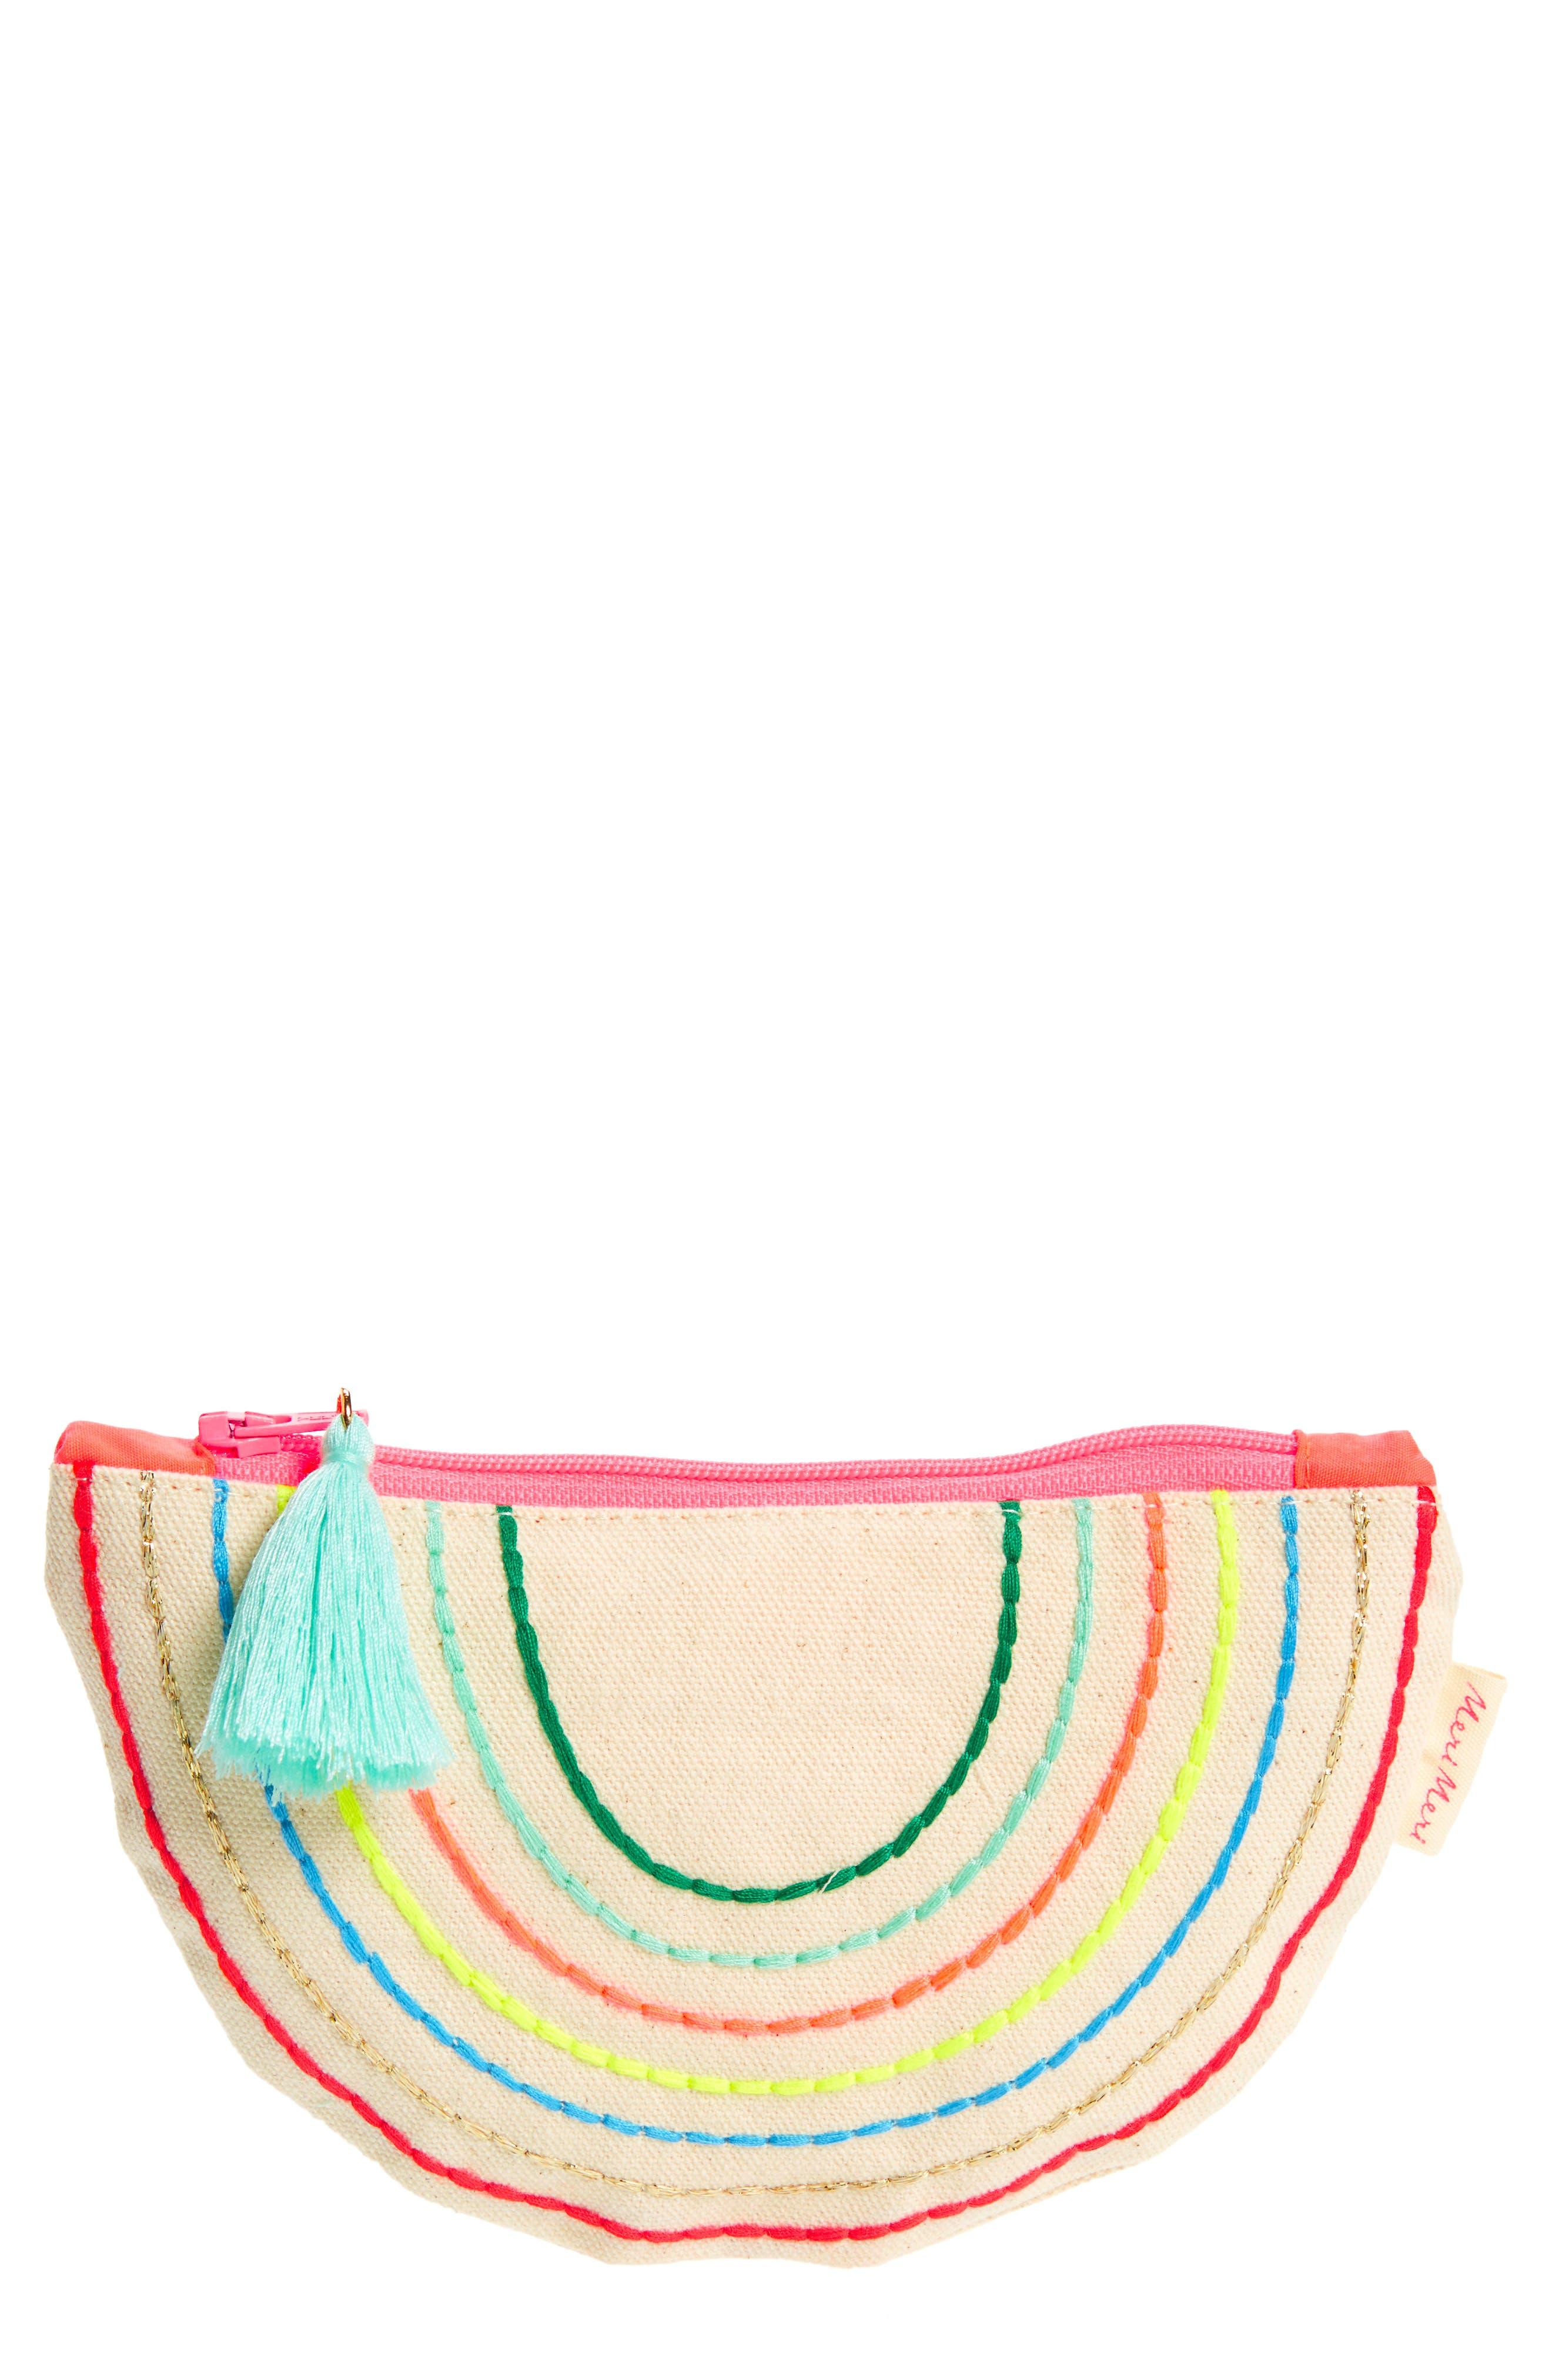 Rainbow Zip Pouch,                             Main thumbnail 1, color,                             900